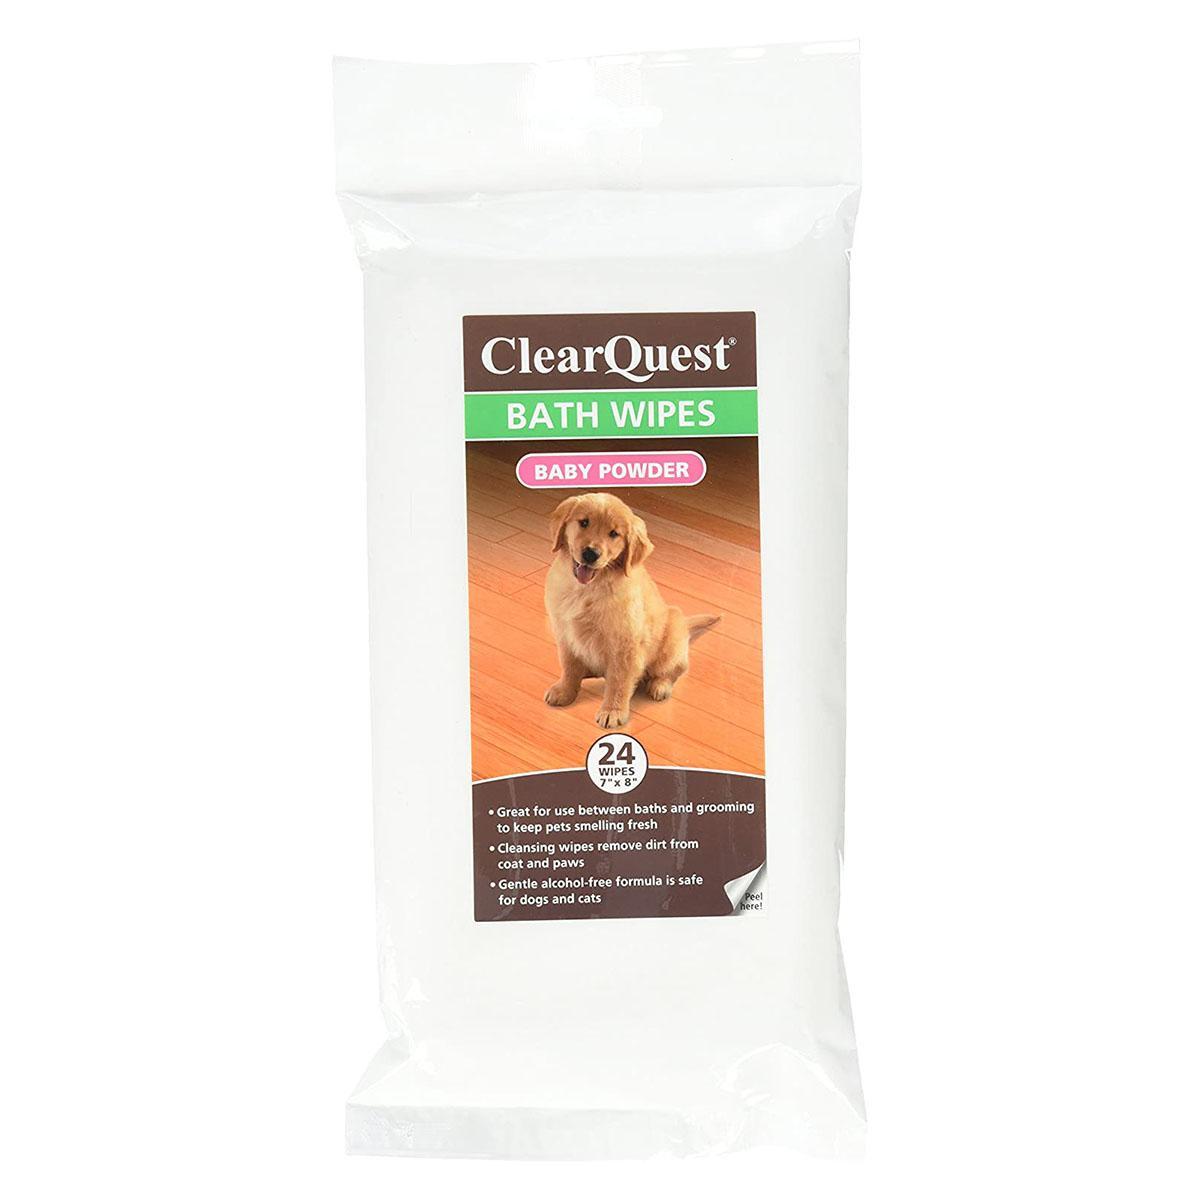 ClearQuest Pet Bath Wipes - Baby Powder